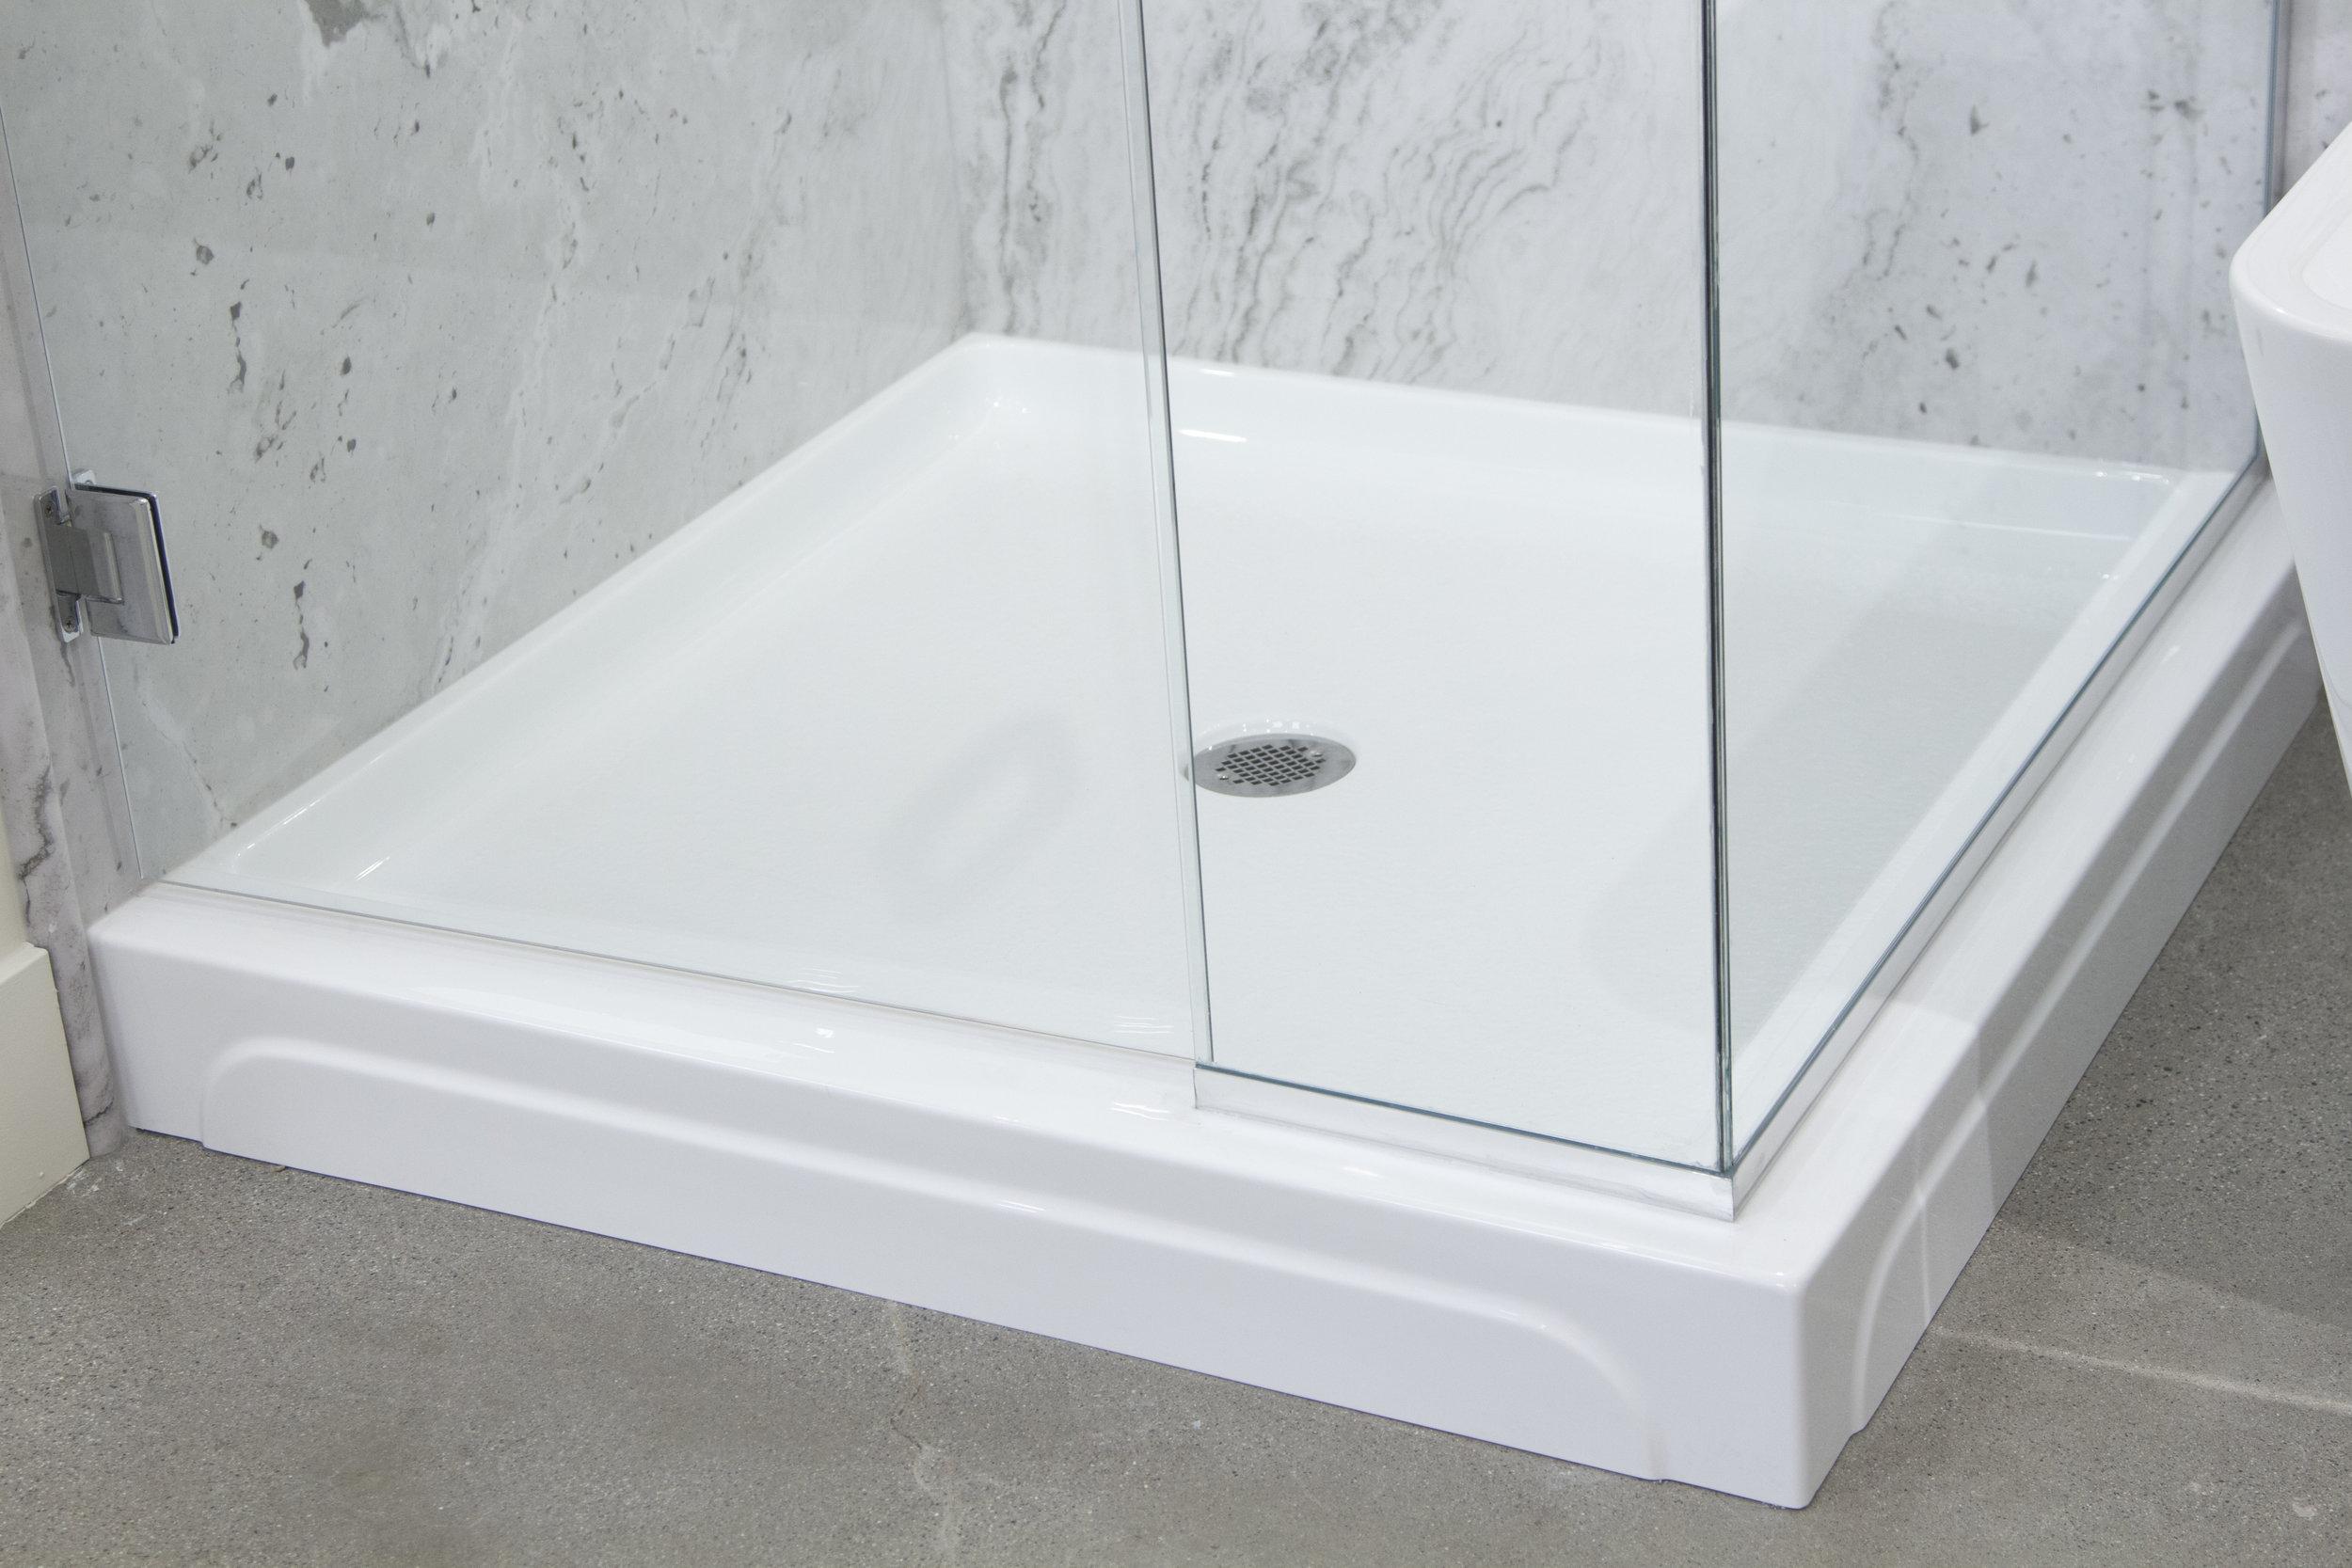 Acrylic Shower Pan.jpg